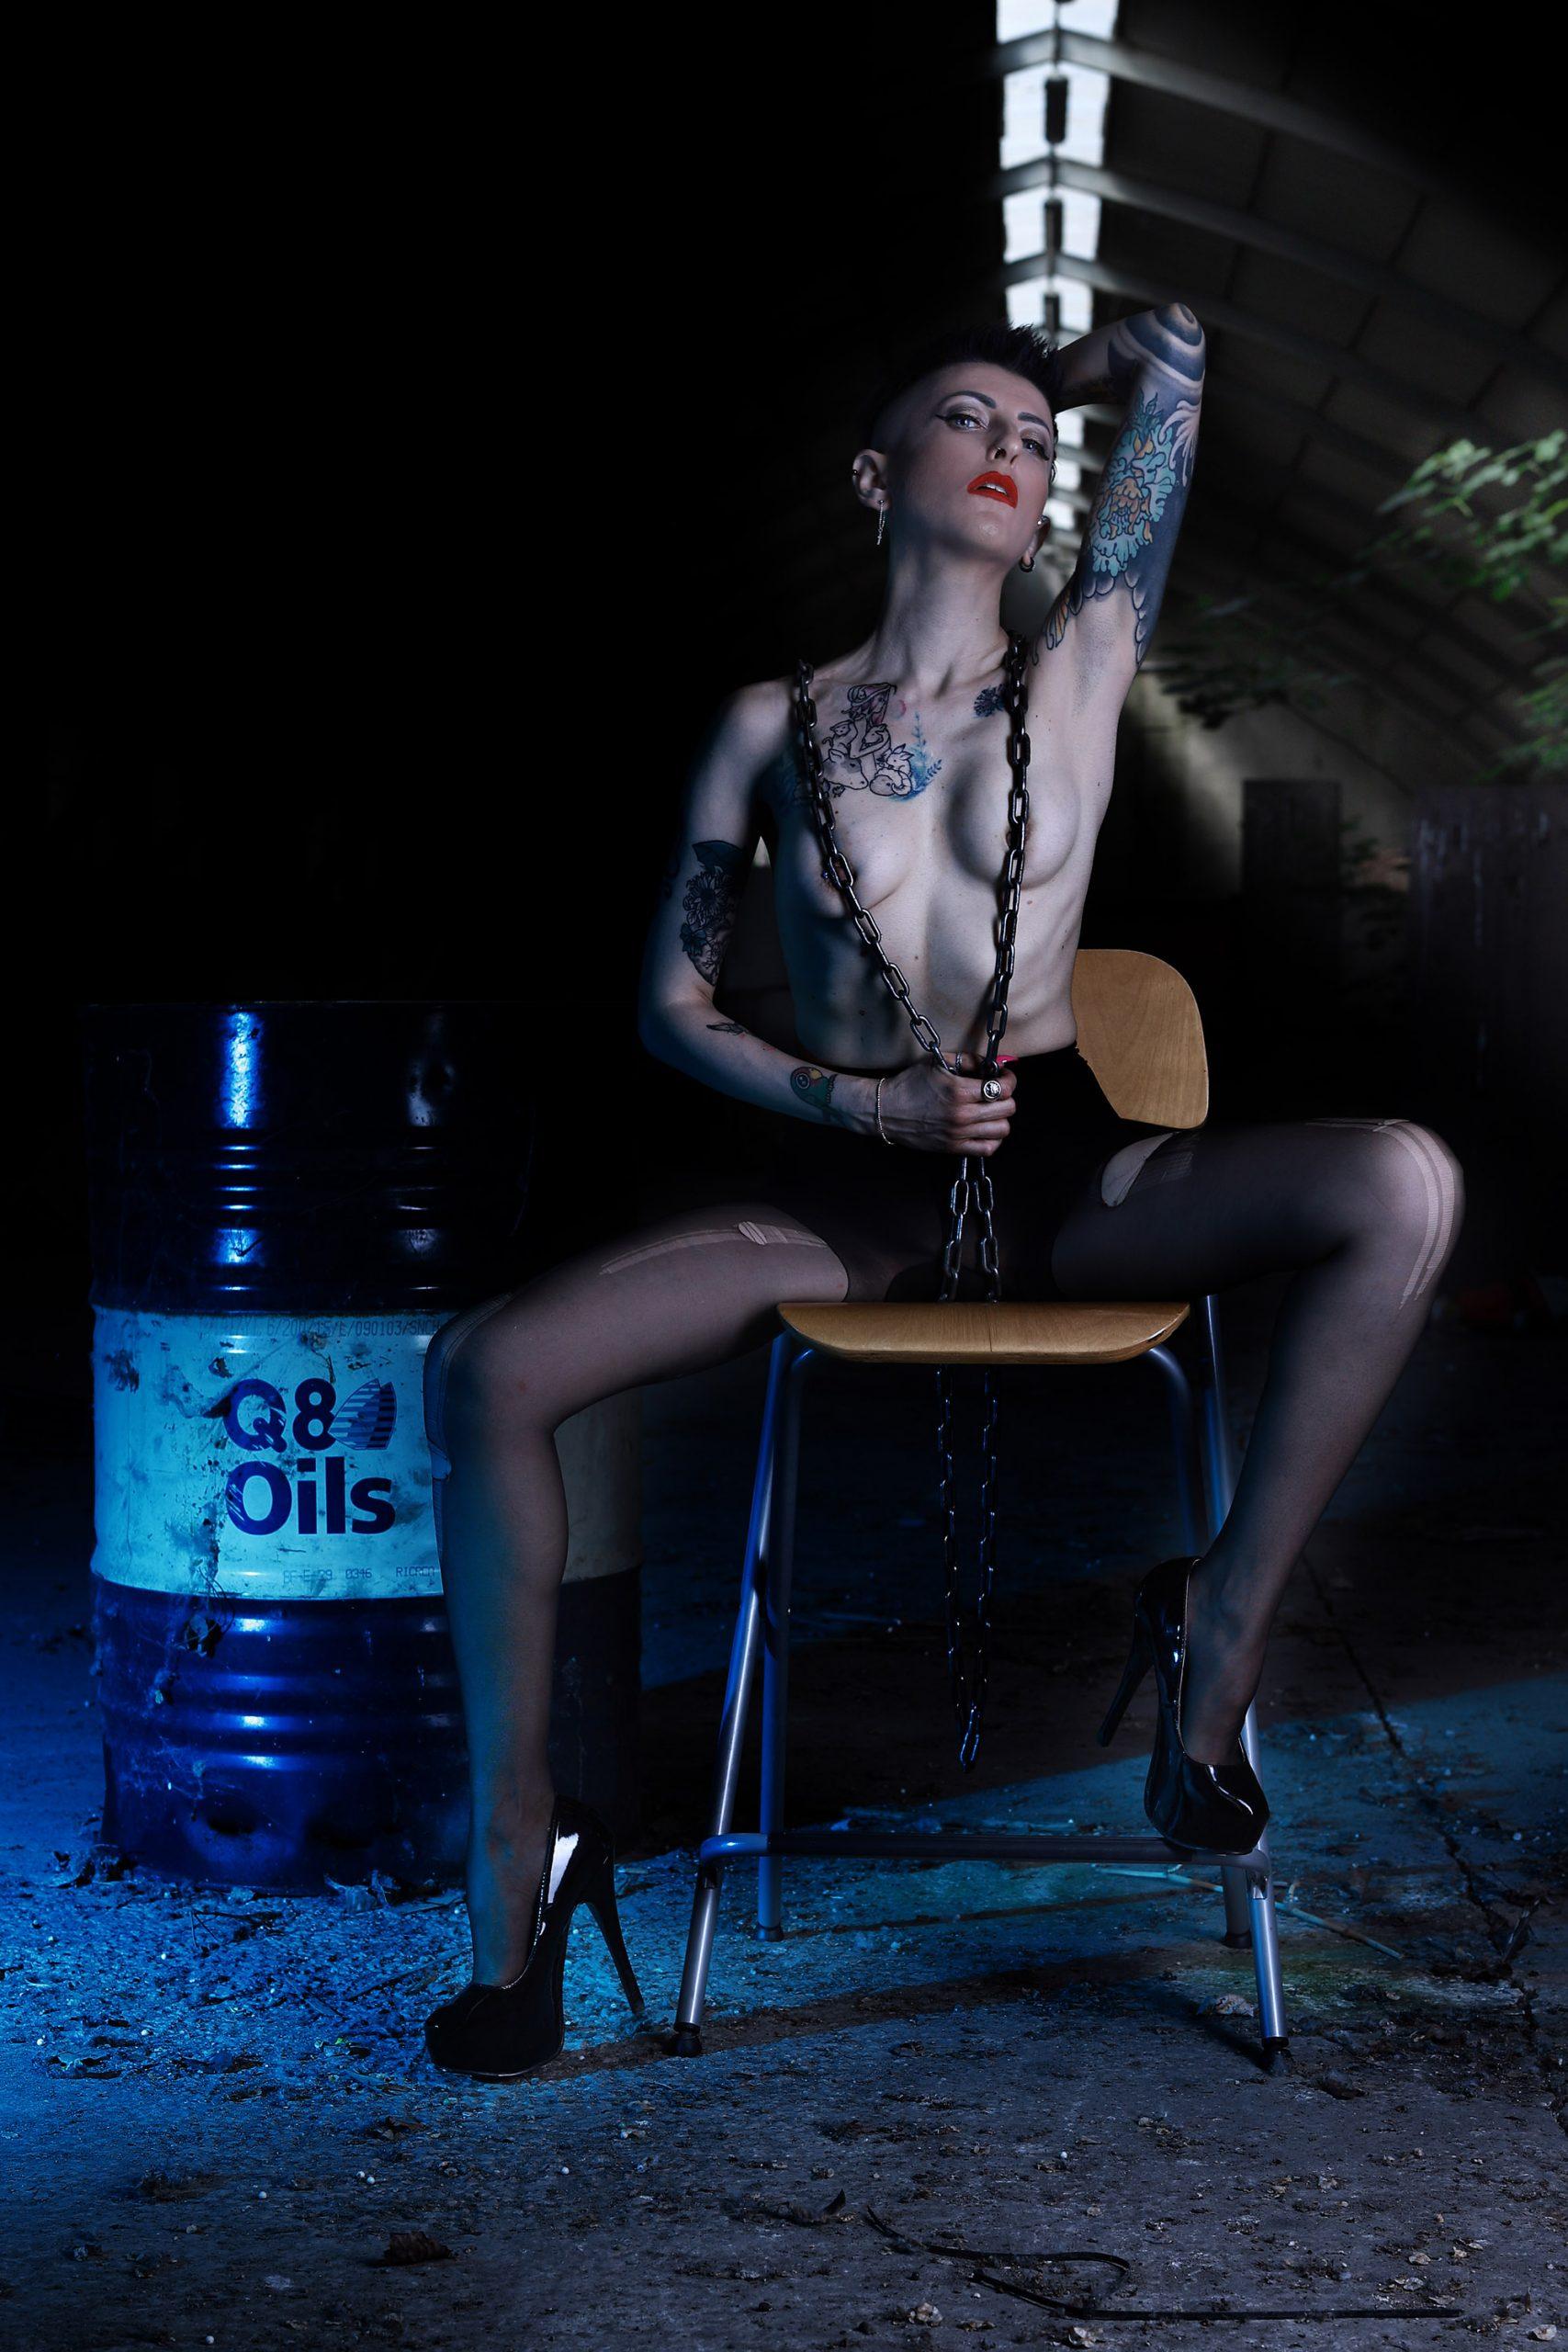 Categorie: Boudoir & Nude, Glamour, Portrait; Photographer: LUCA BARTOLI (ElleBierre photographer); Model: LAURA PAGANO; Location: Ferrara, FE, Italia